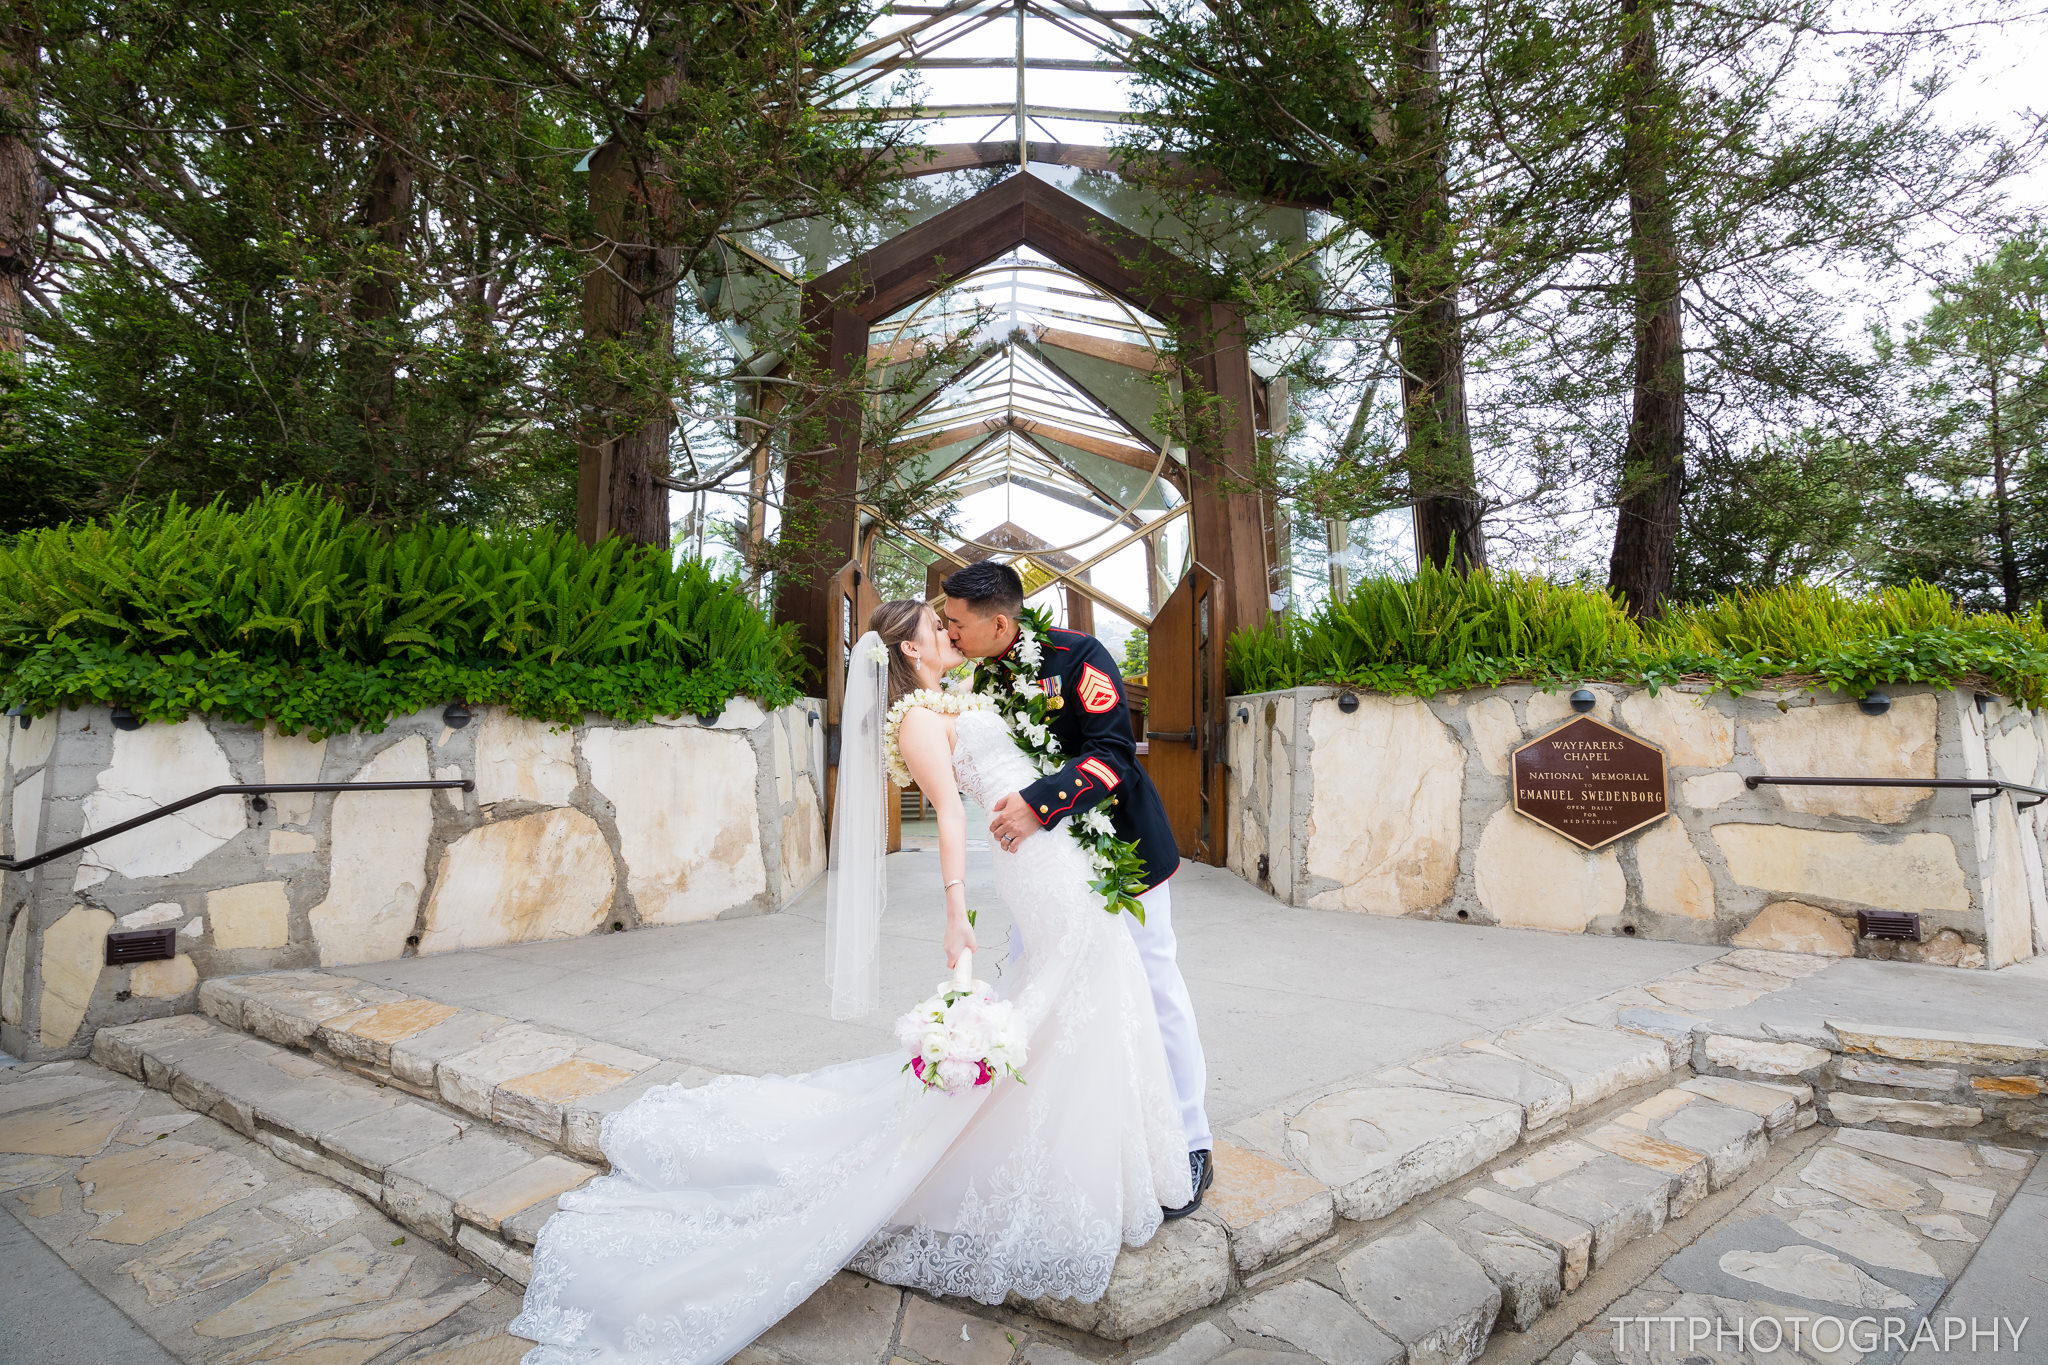 Wayfarers Chapel Wedding.Usmc Wayfarers Chapel Wedding Bluewater Grill Tttphotography